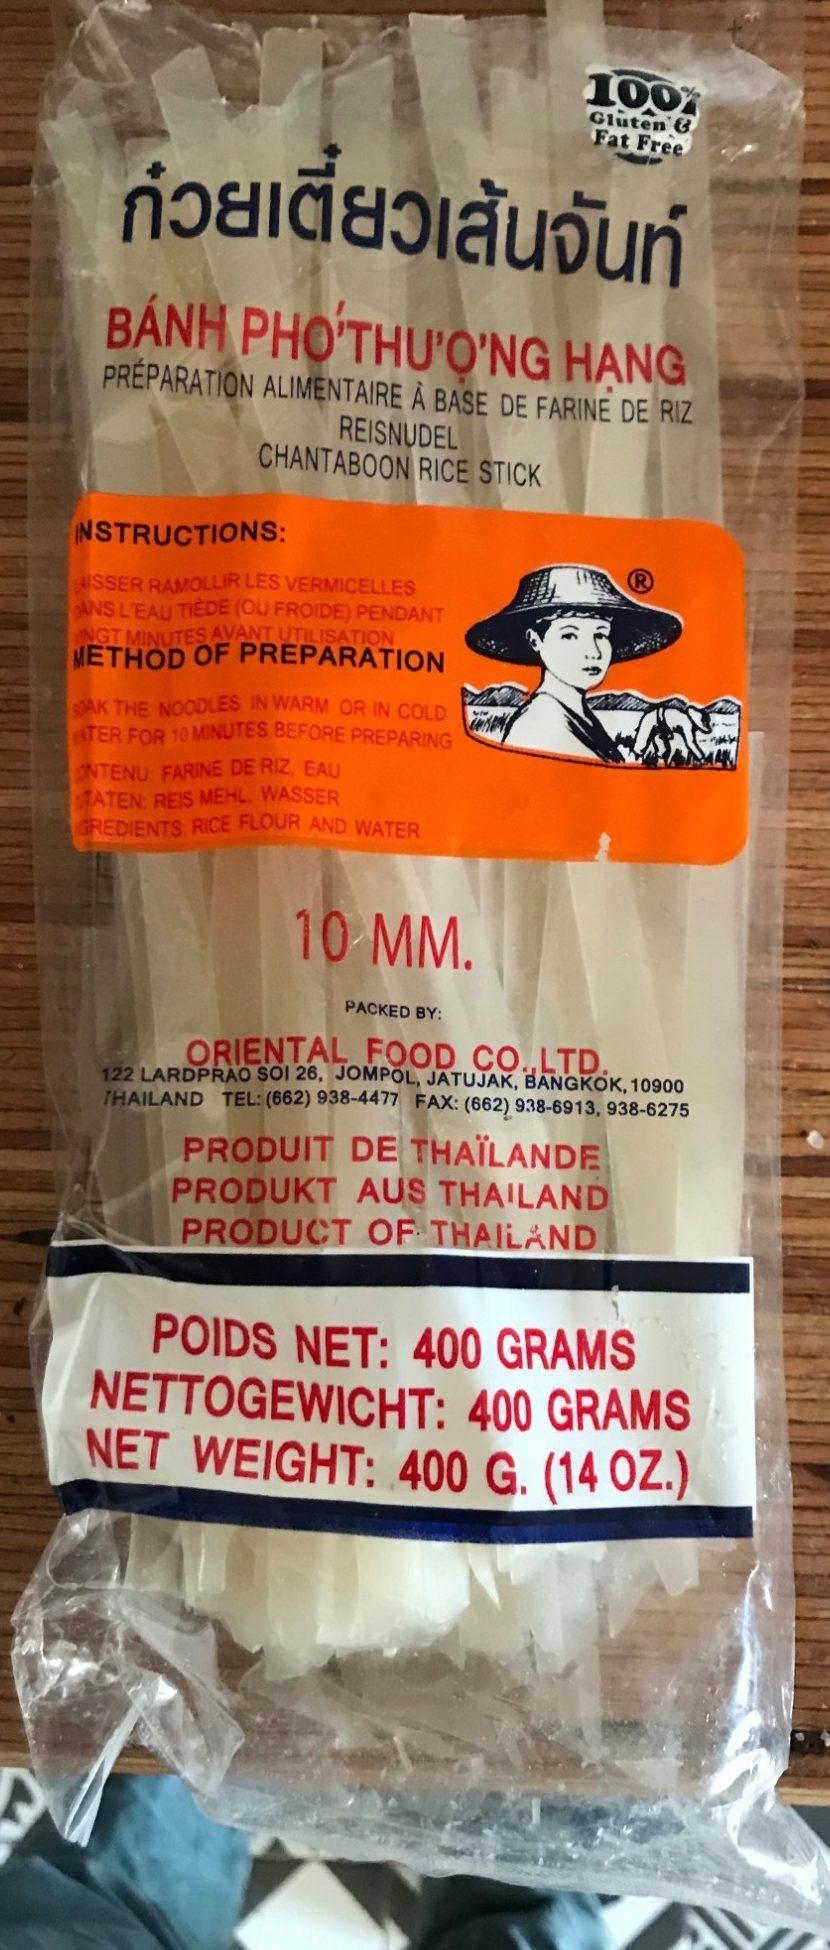 BANH PHO THUONG HANG rice noodles - Oriental Food Co  Ltd - 400g